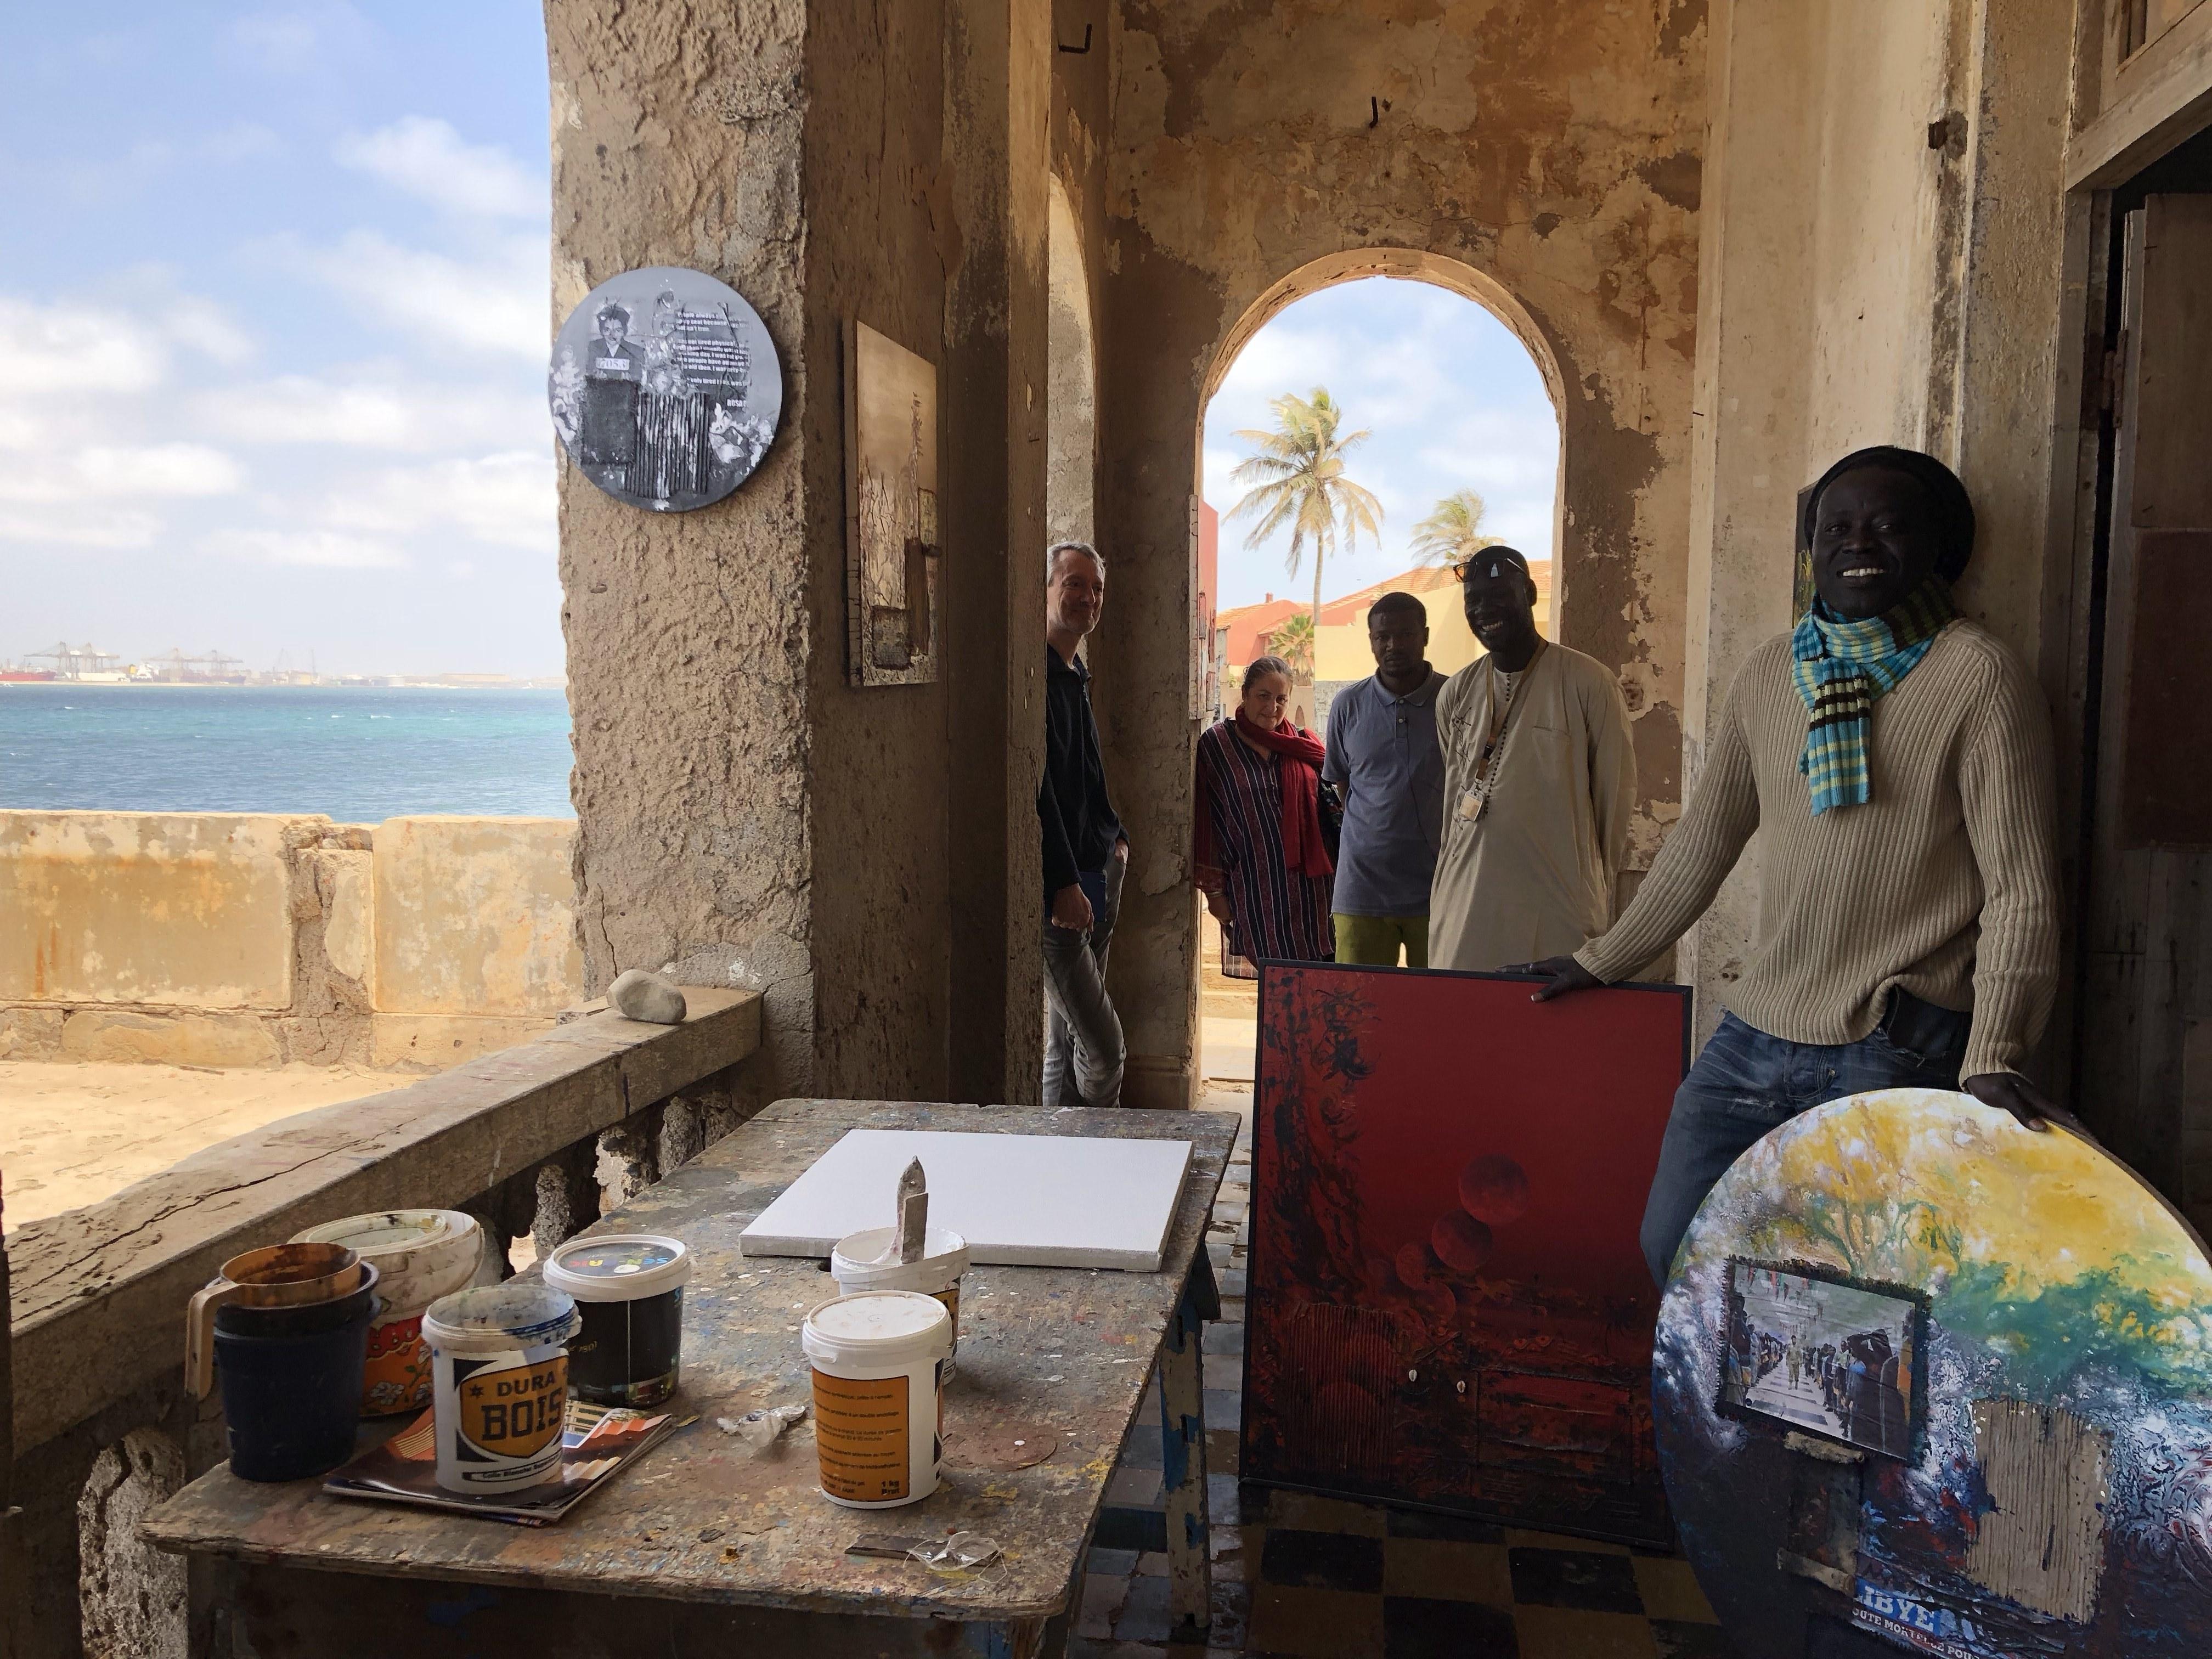 Bekende schilder Gorée